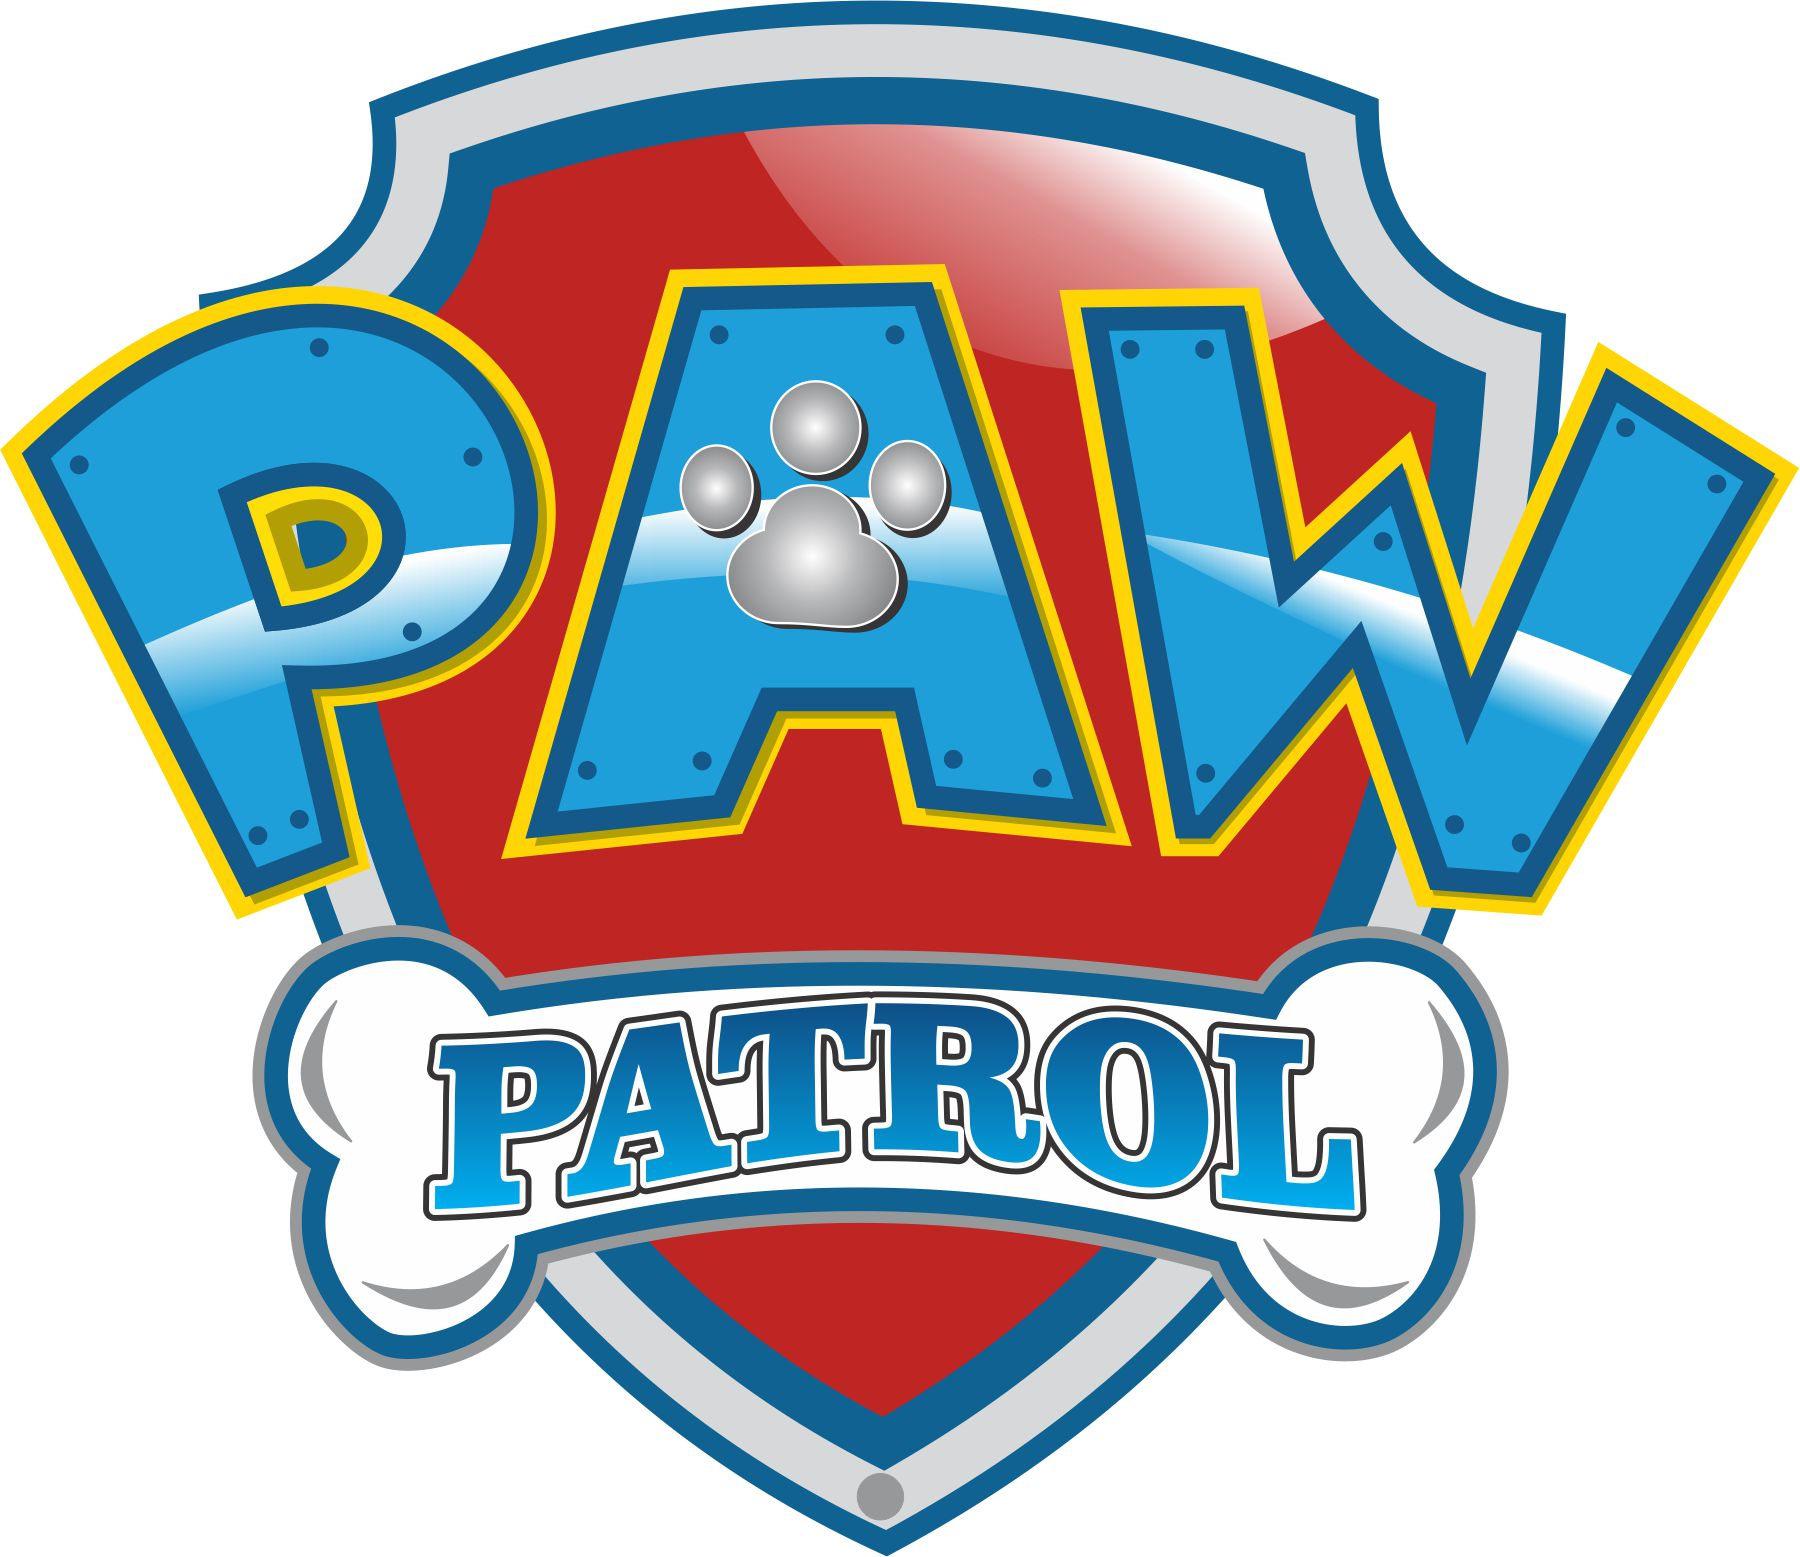 Paw patrol Logos